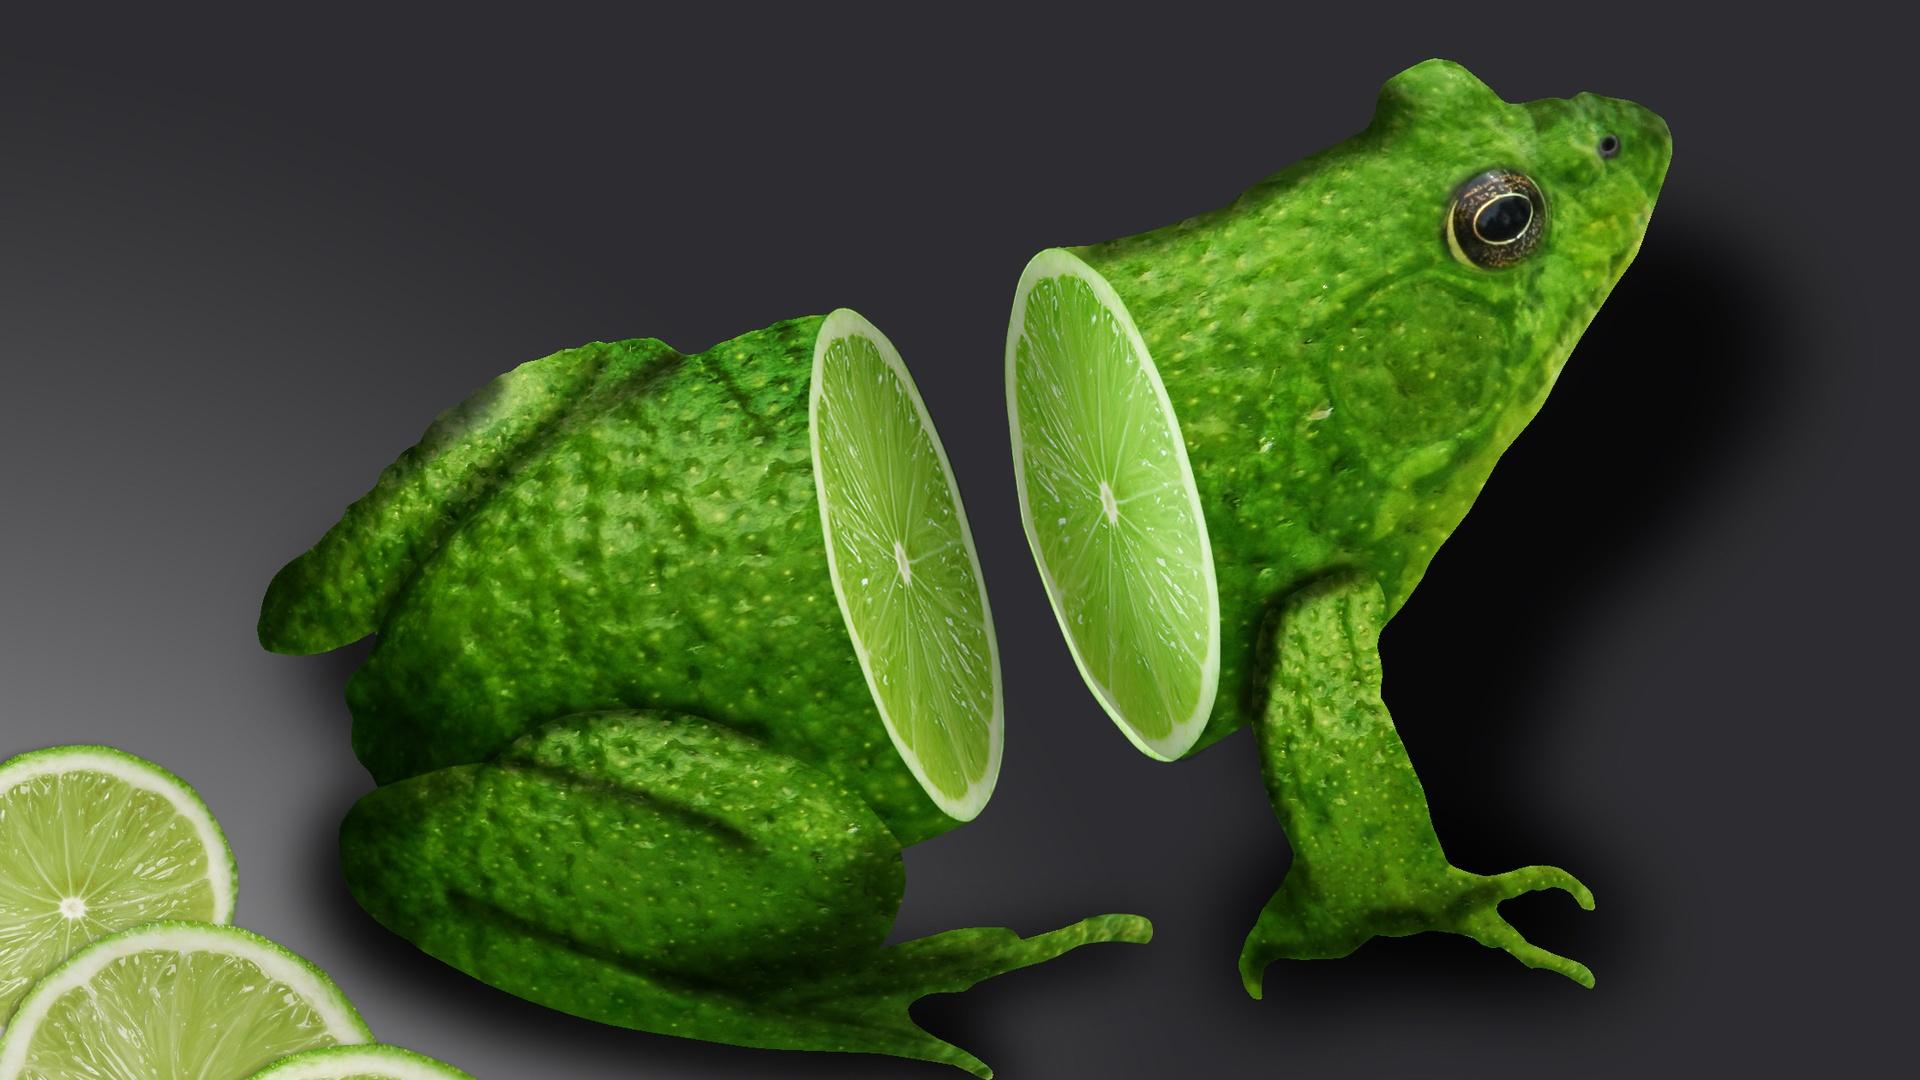 Download Wallpaper Pc 3d Lemon Frog Wallpapers 1920x1080 395436